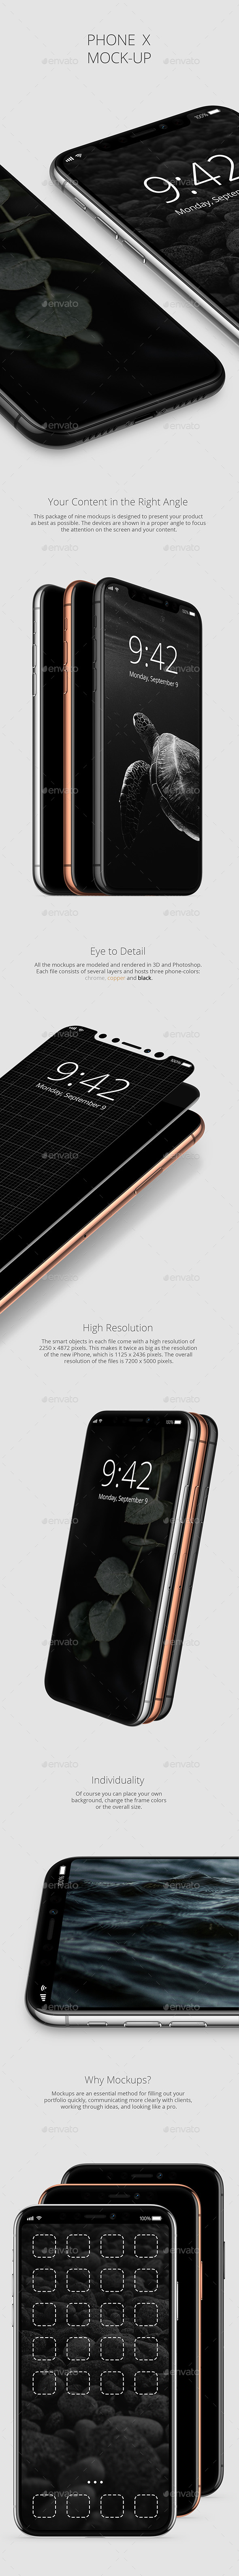 GraphicRiver Phone X Mockup 20618447